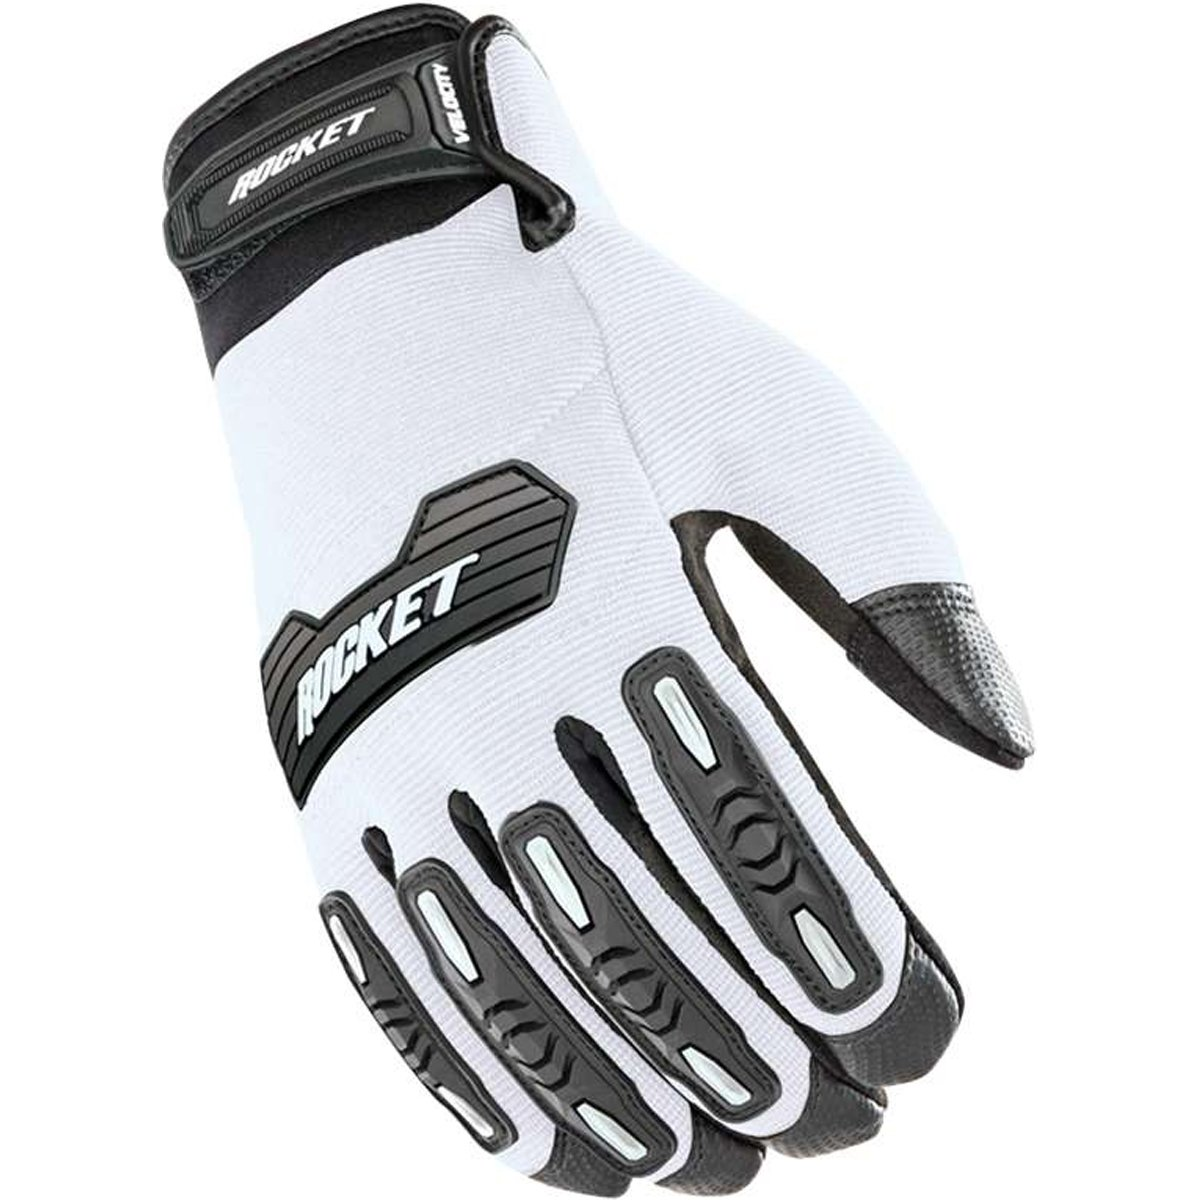 Joe Rocket Velocity 2.0 Men's Textile Street Motorcycle Gloves - White/Black / Large